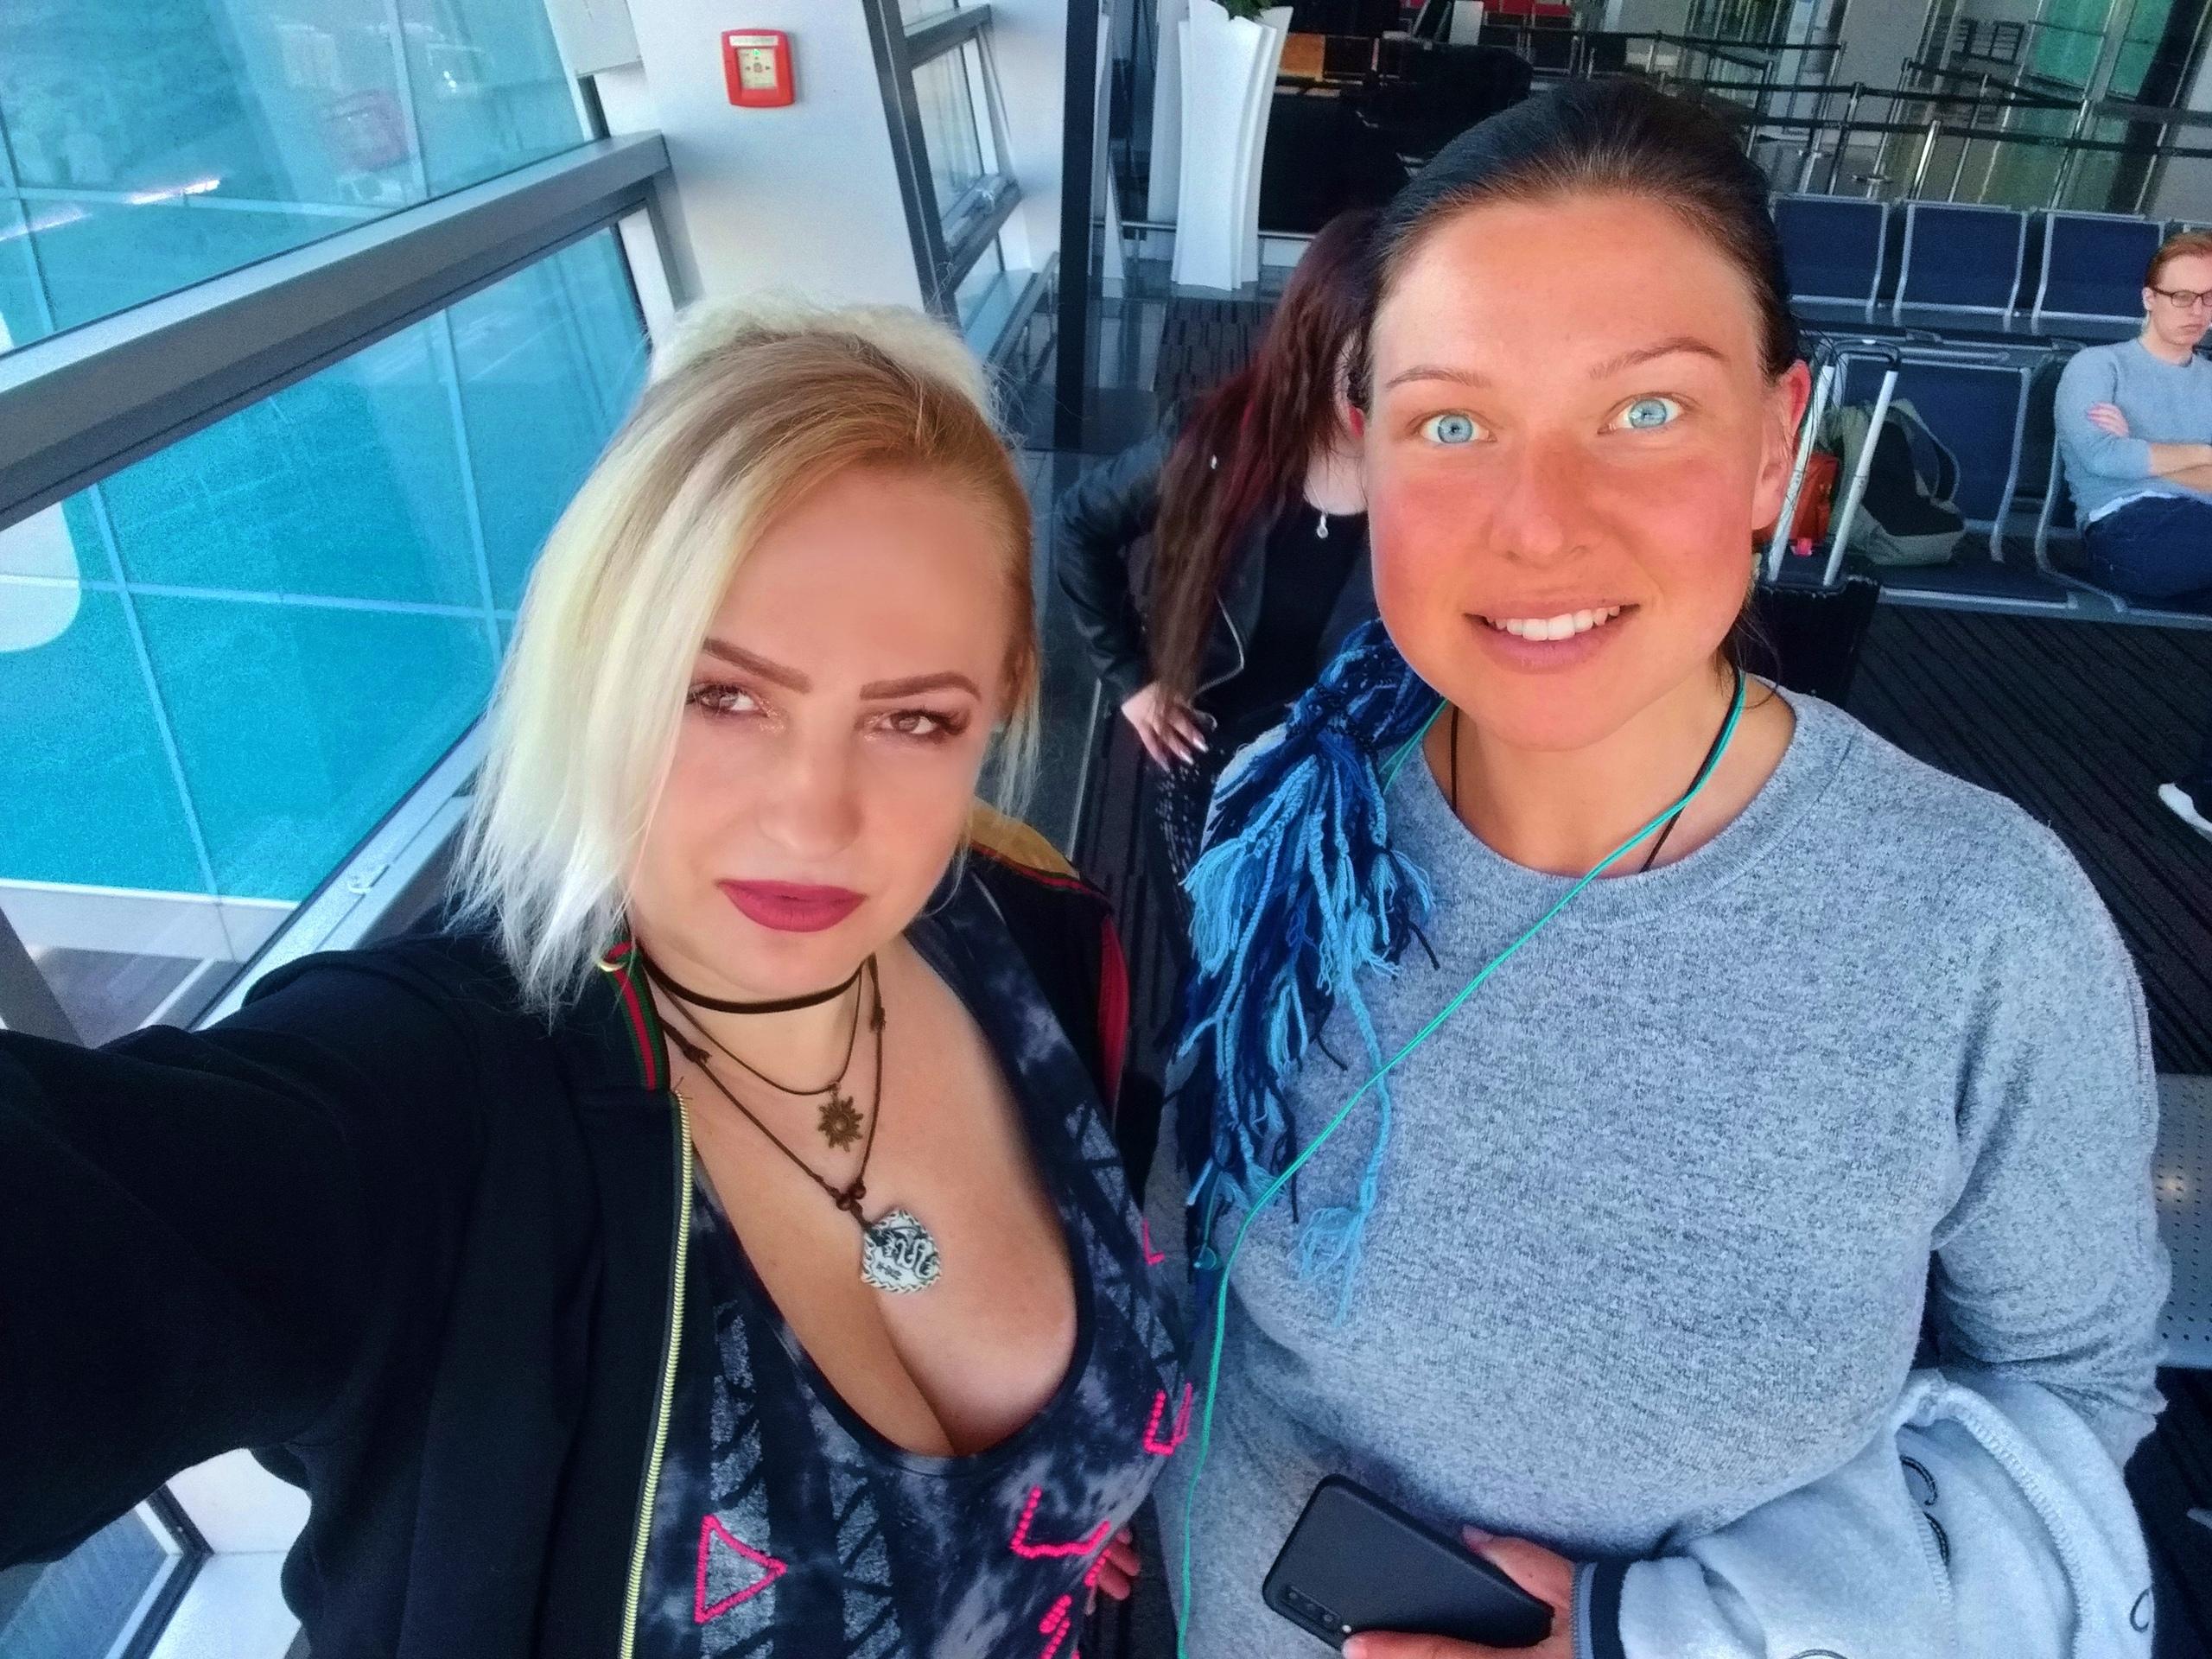 Елена Руденко (Валтея). Мои путешествия. Таиланд ( 2019 г. осень) ФОТО. 3pv3P3IE3UE